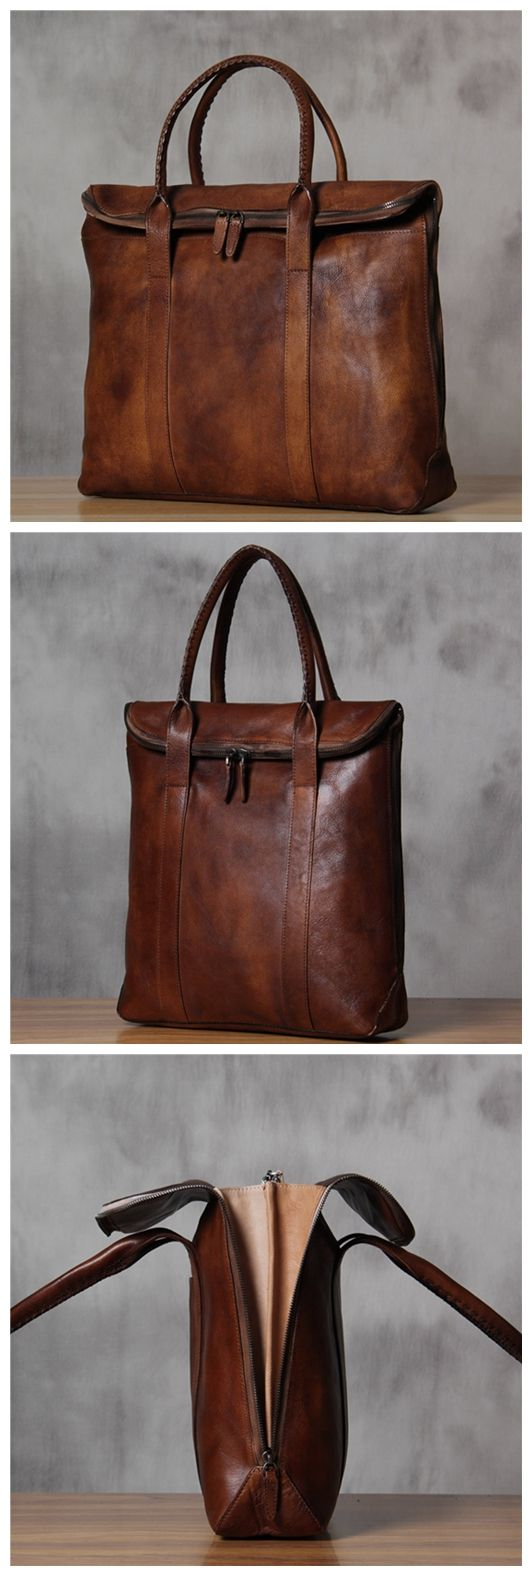 ROCKCOW 15 Inches Vintage Genuine Leather Briefcase, Messenger Bag, Laptop Bag